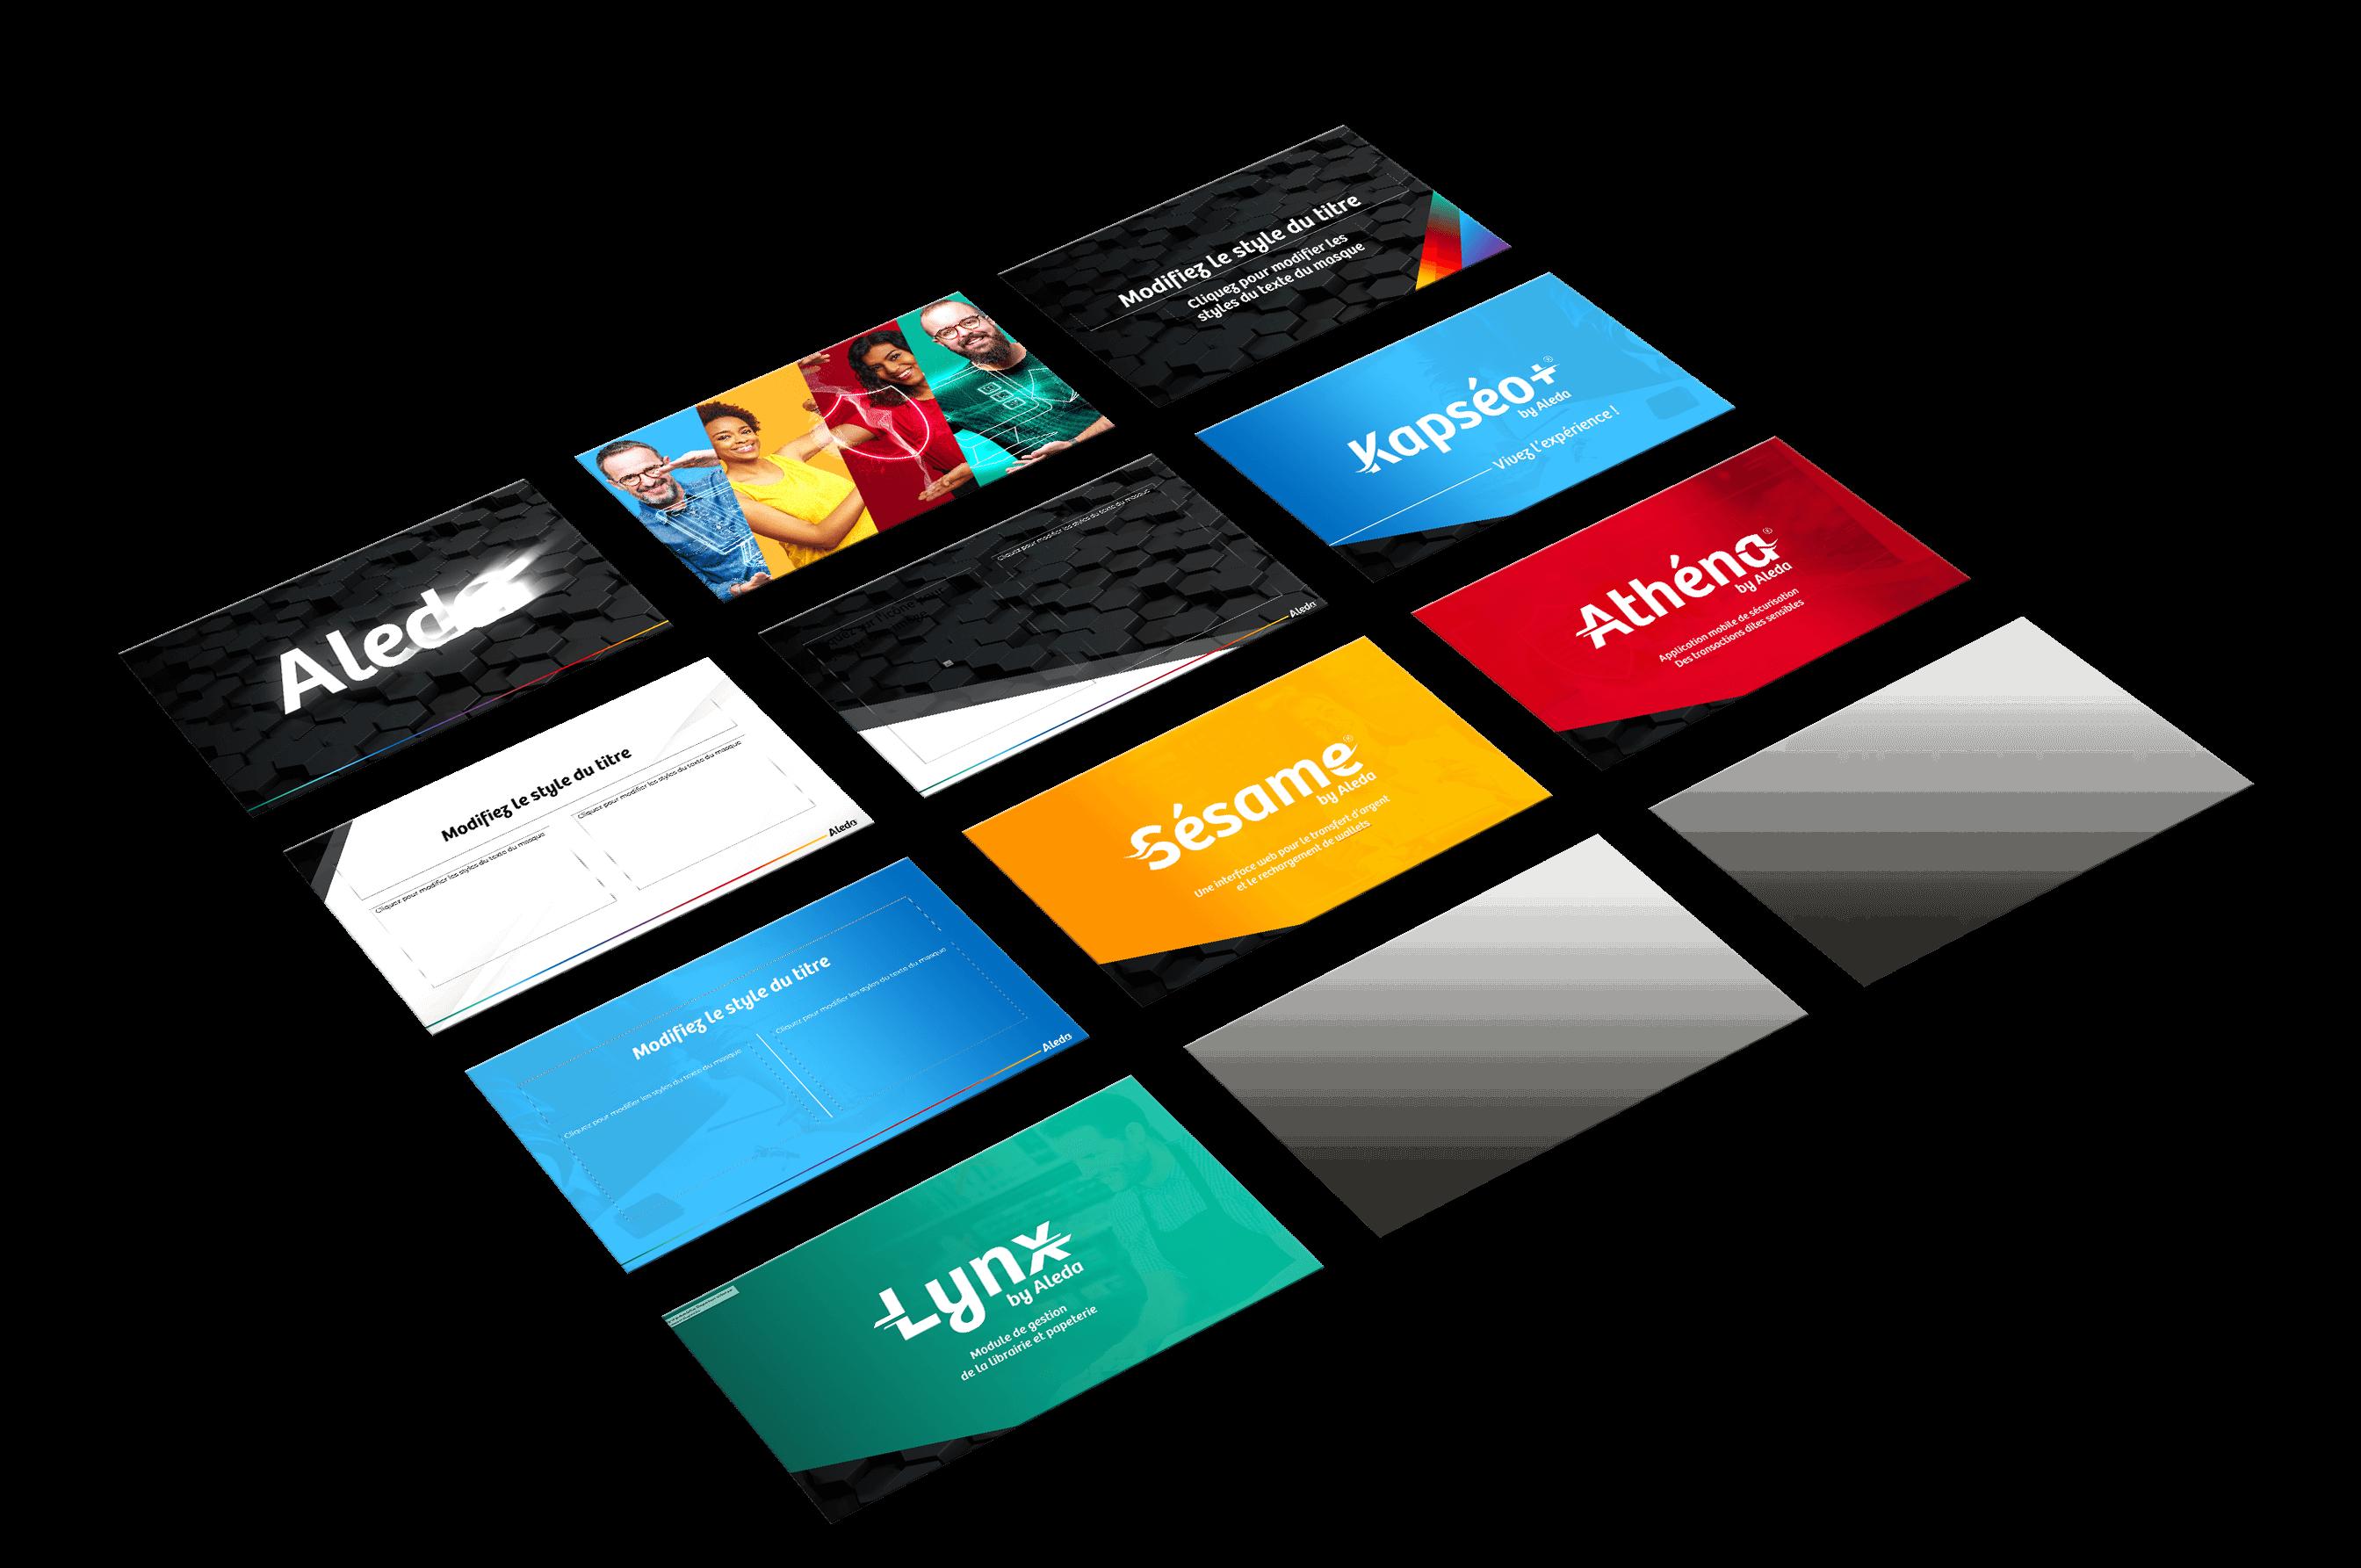 aleda-site-web-maquettes-digital-identite-visuelle-template-powerpoint